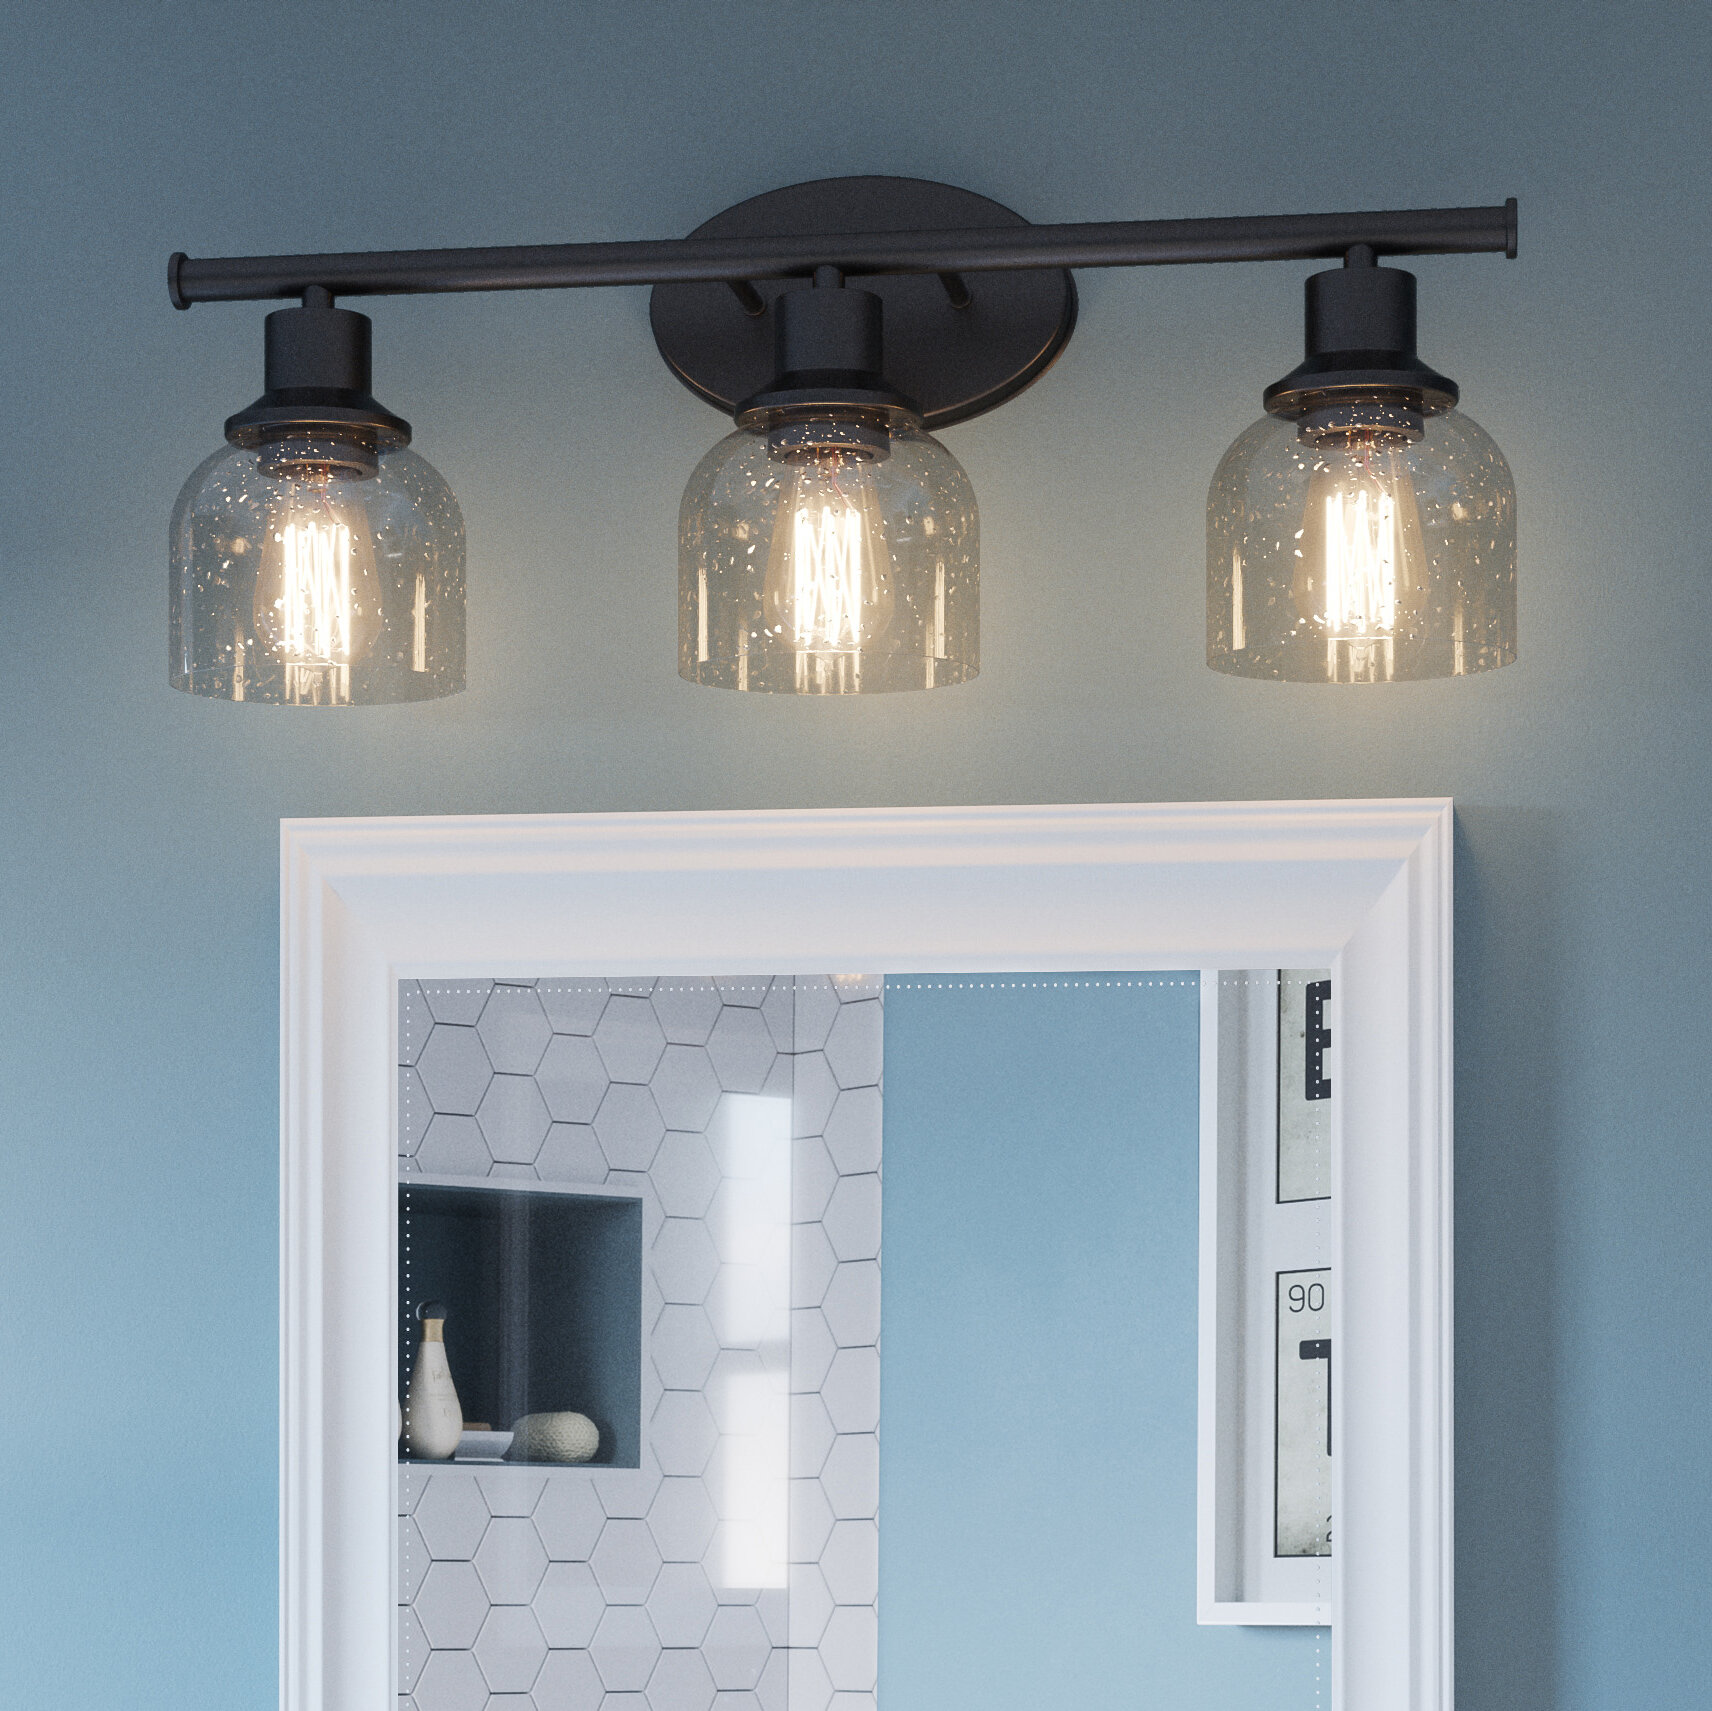 Higgston 3 Light Dimmable Bronze Vanity Light Reviews Birch Lane